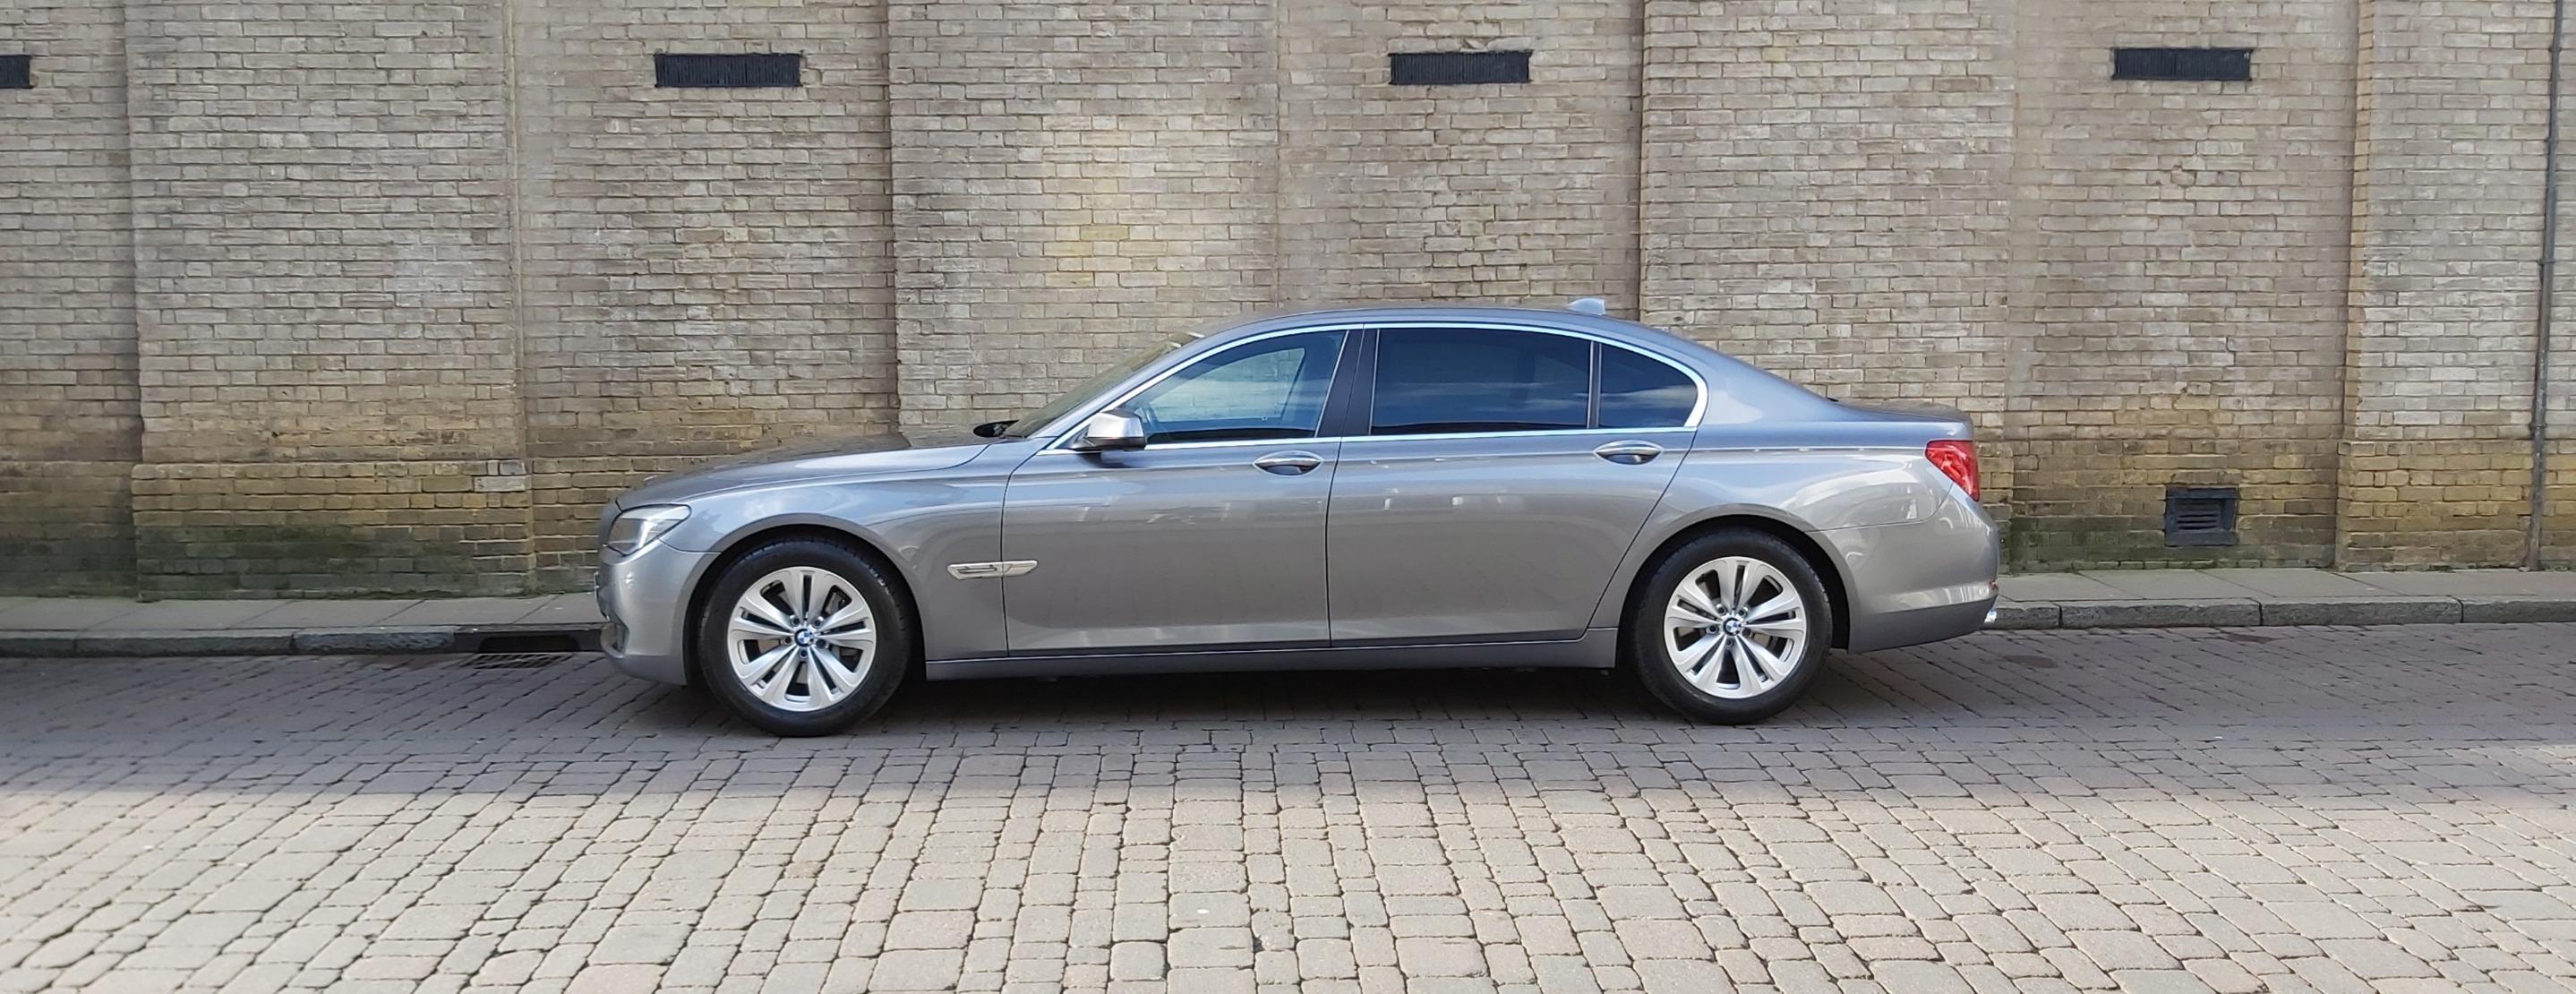 LUXURY TRAVEL | BMW 7 SERIES LWB